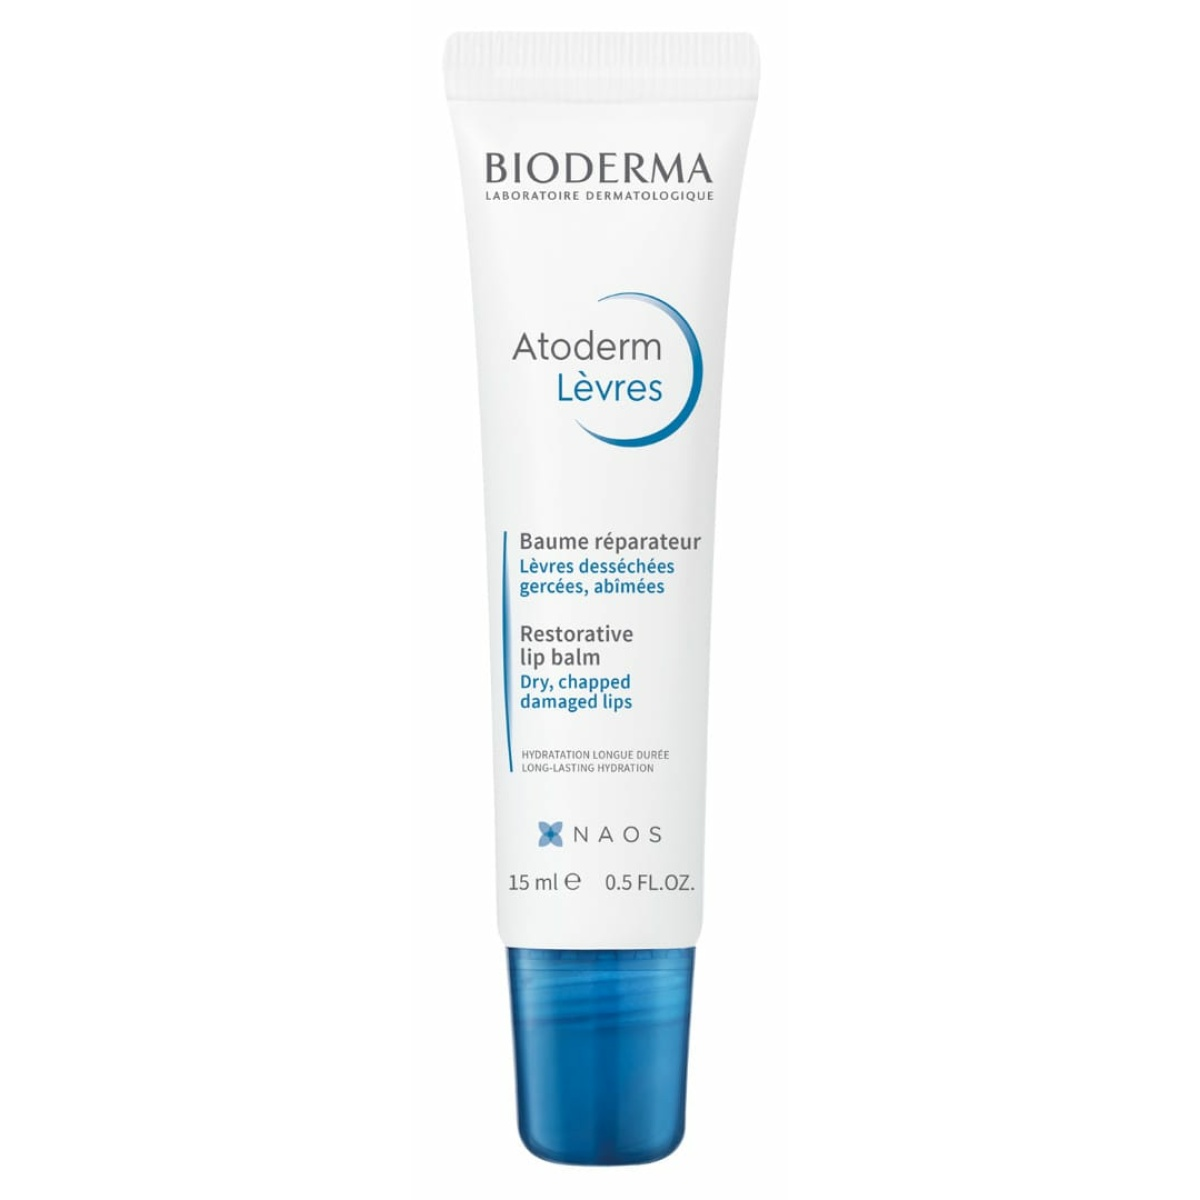 BIODERMA Atoderm Levres lūpu balzāms 15 ml